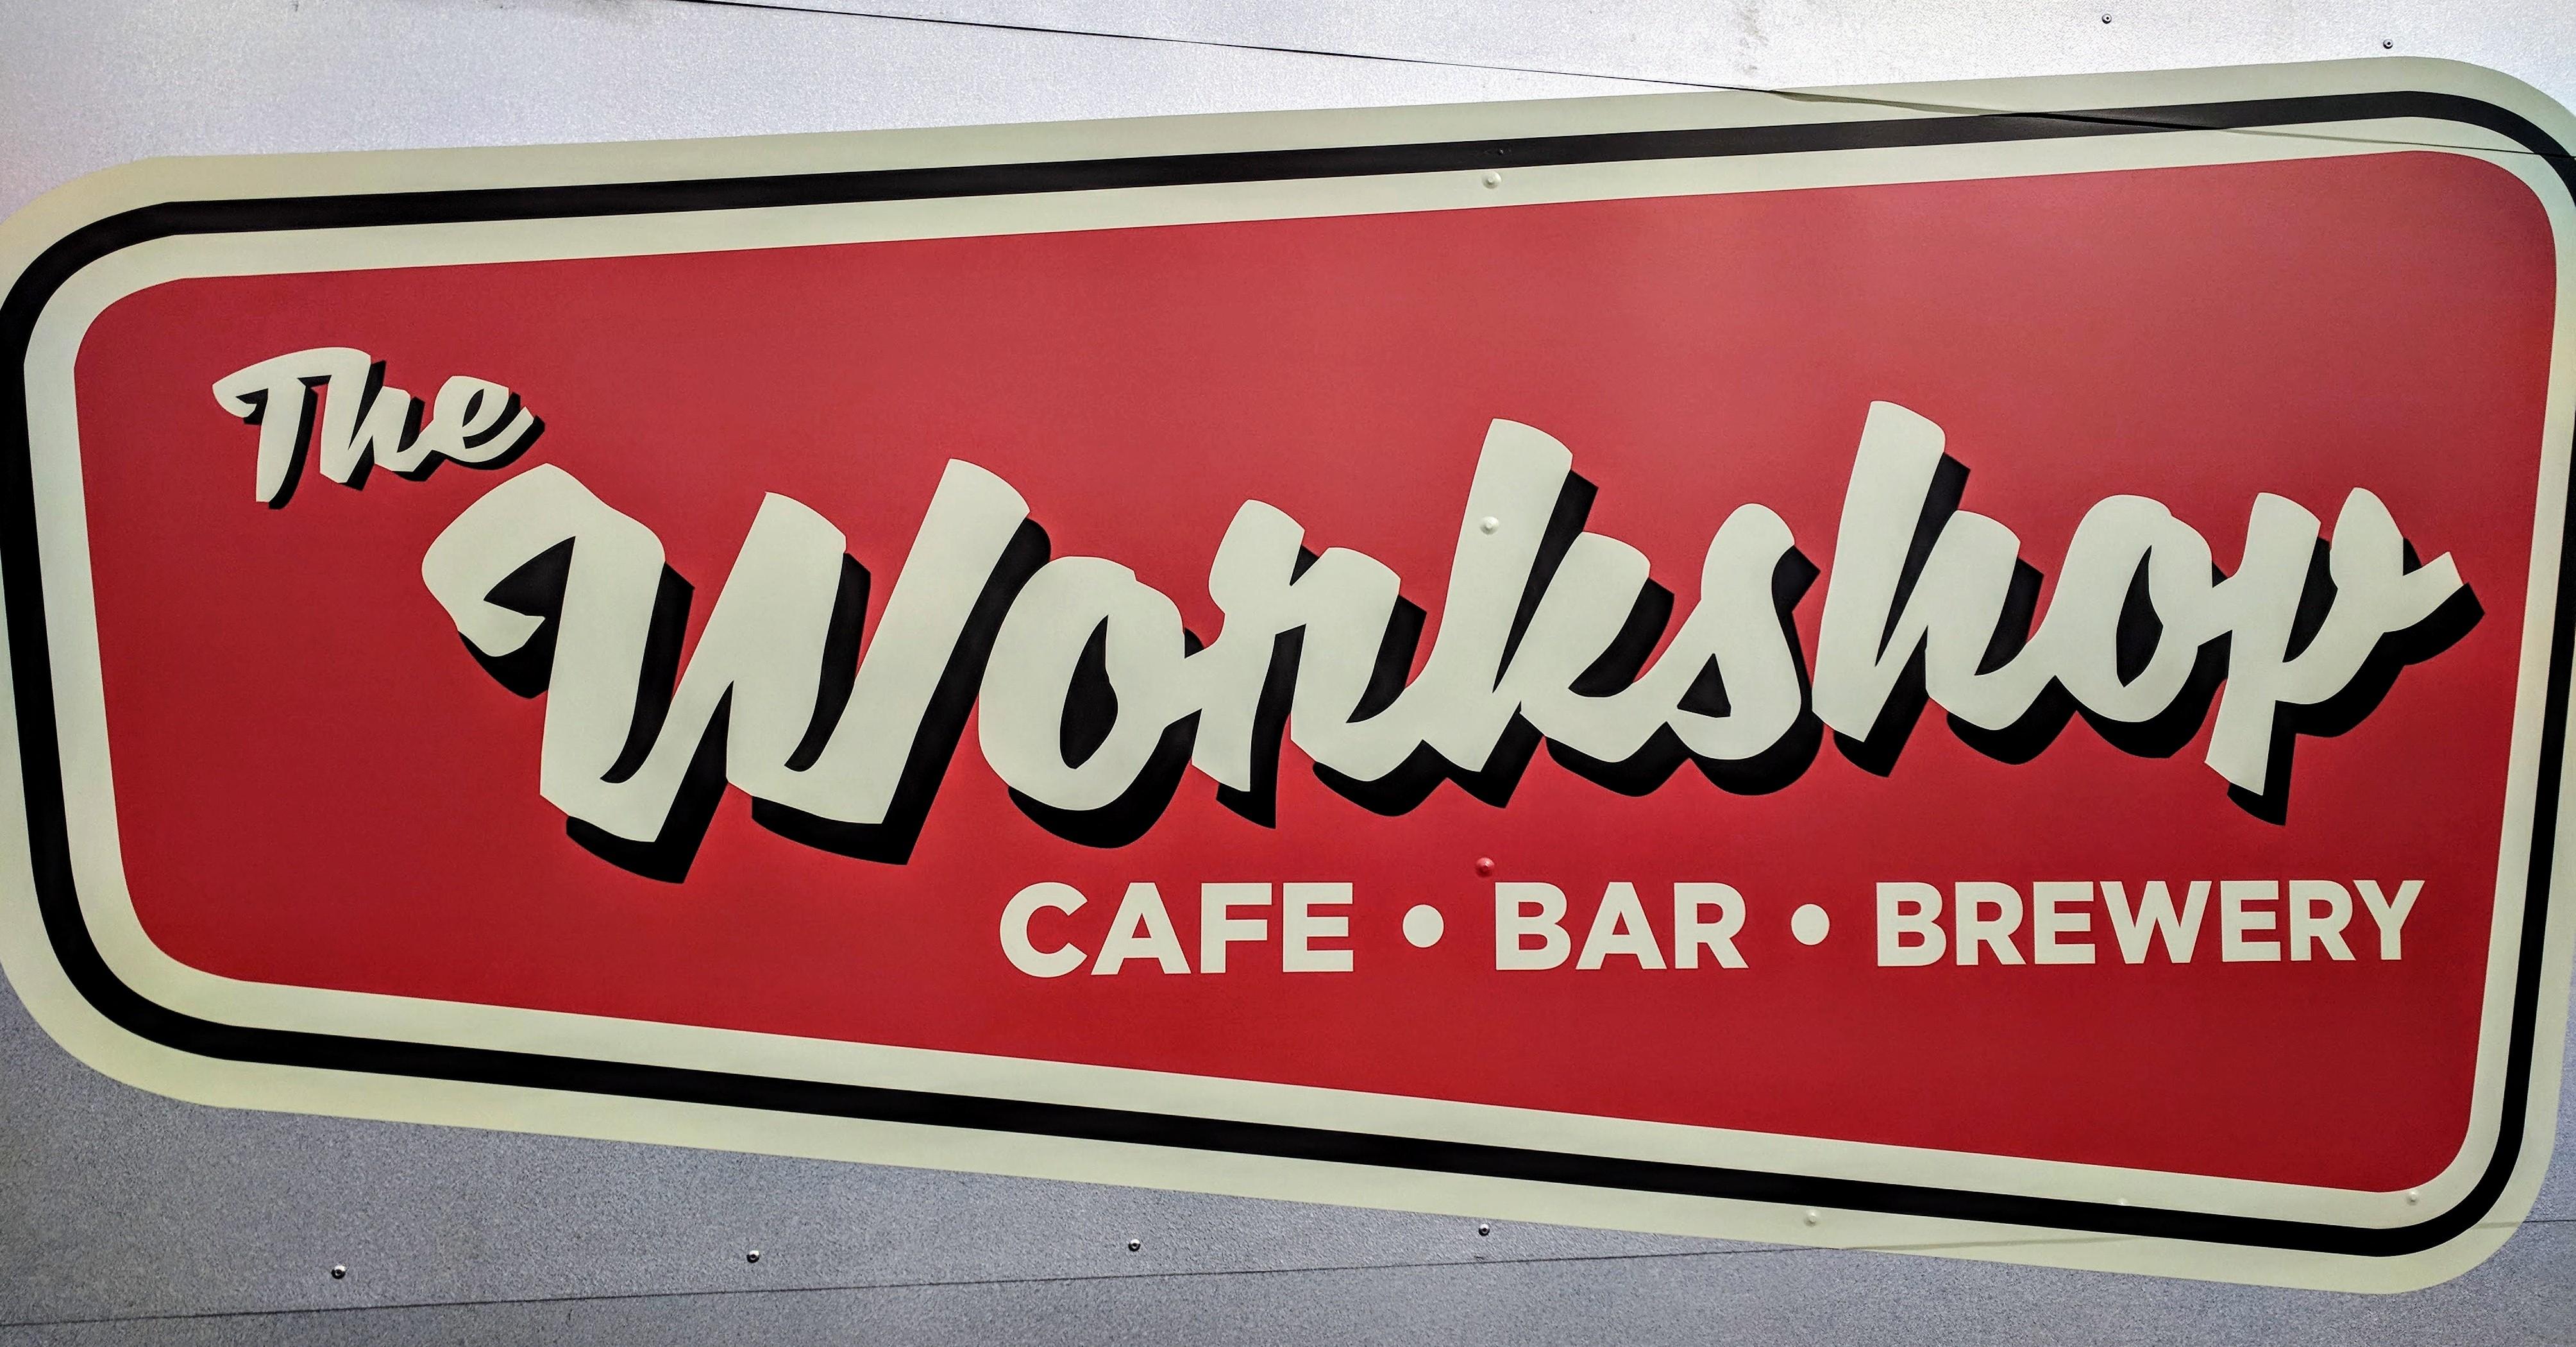 The 'Wonkshop' sign